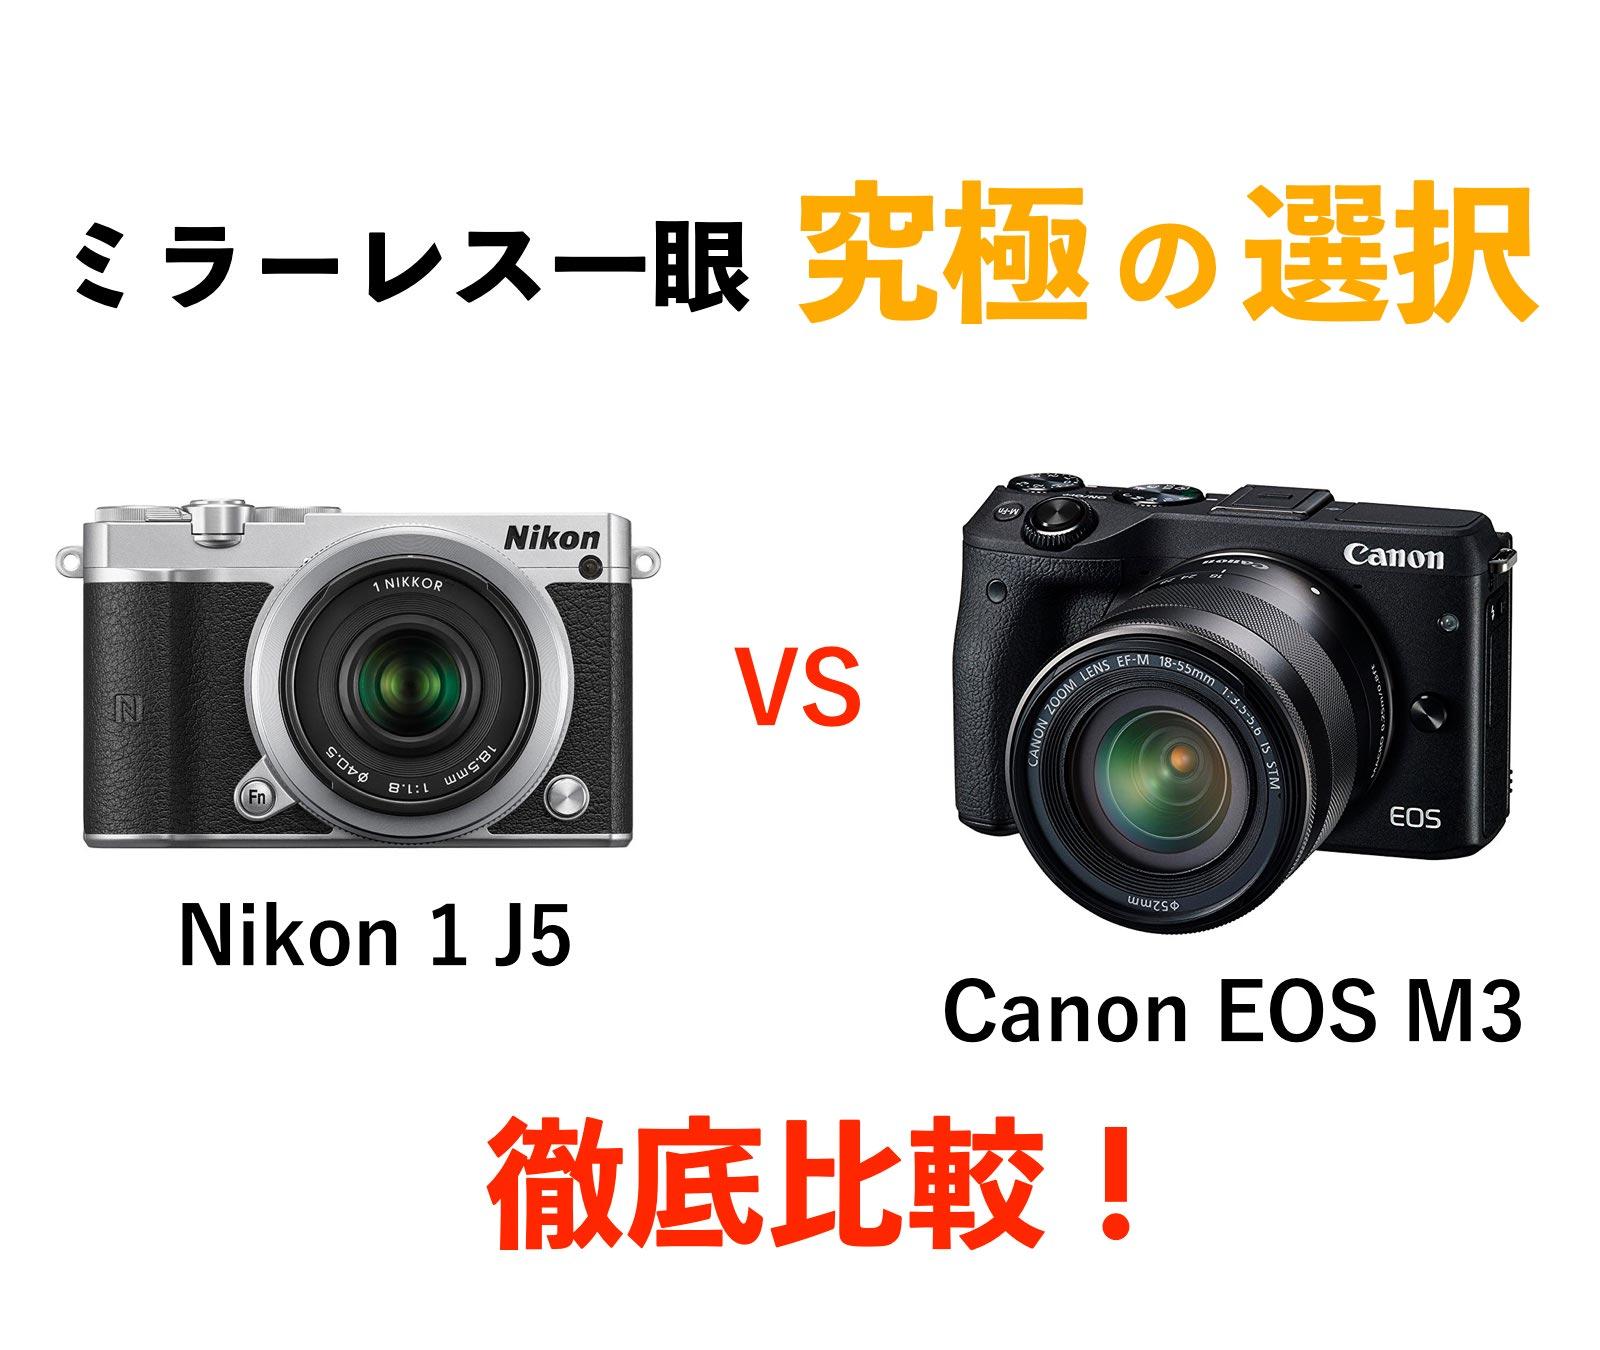 Nikon1 J5 vs Cannon EOS M3